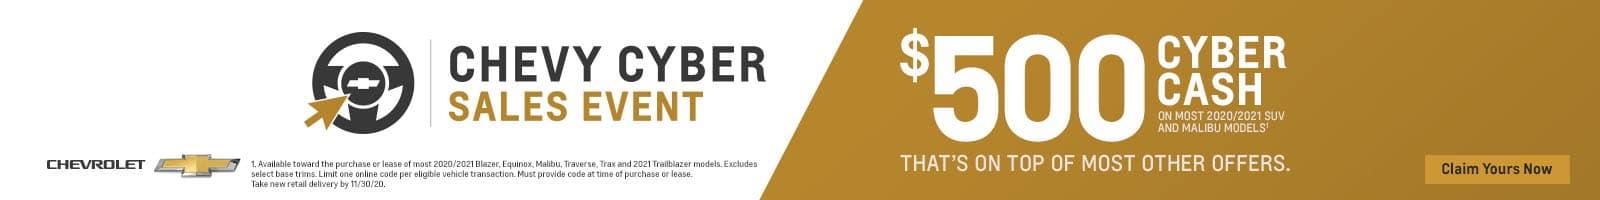 01_2020_NOVEMBER_ 500 CYBER CASH GENERIC_NATIONAL_1600x200 BANNER (1)